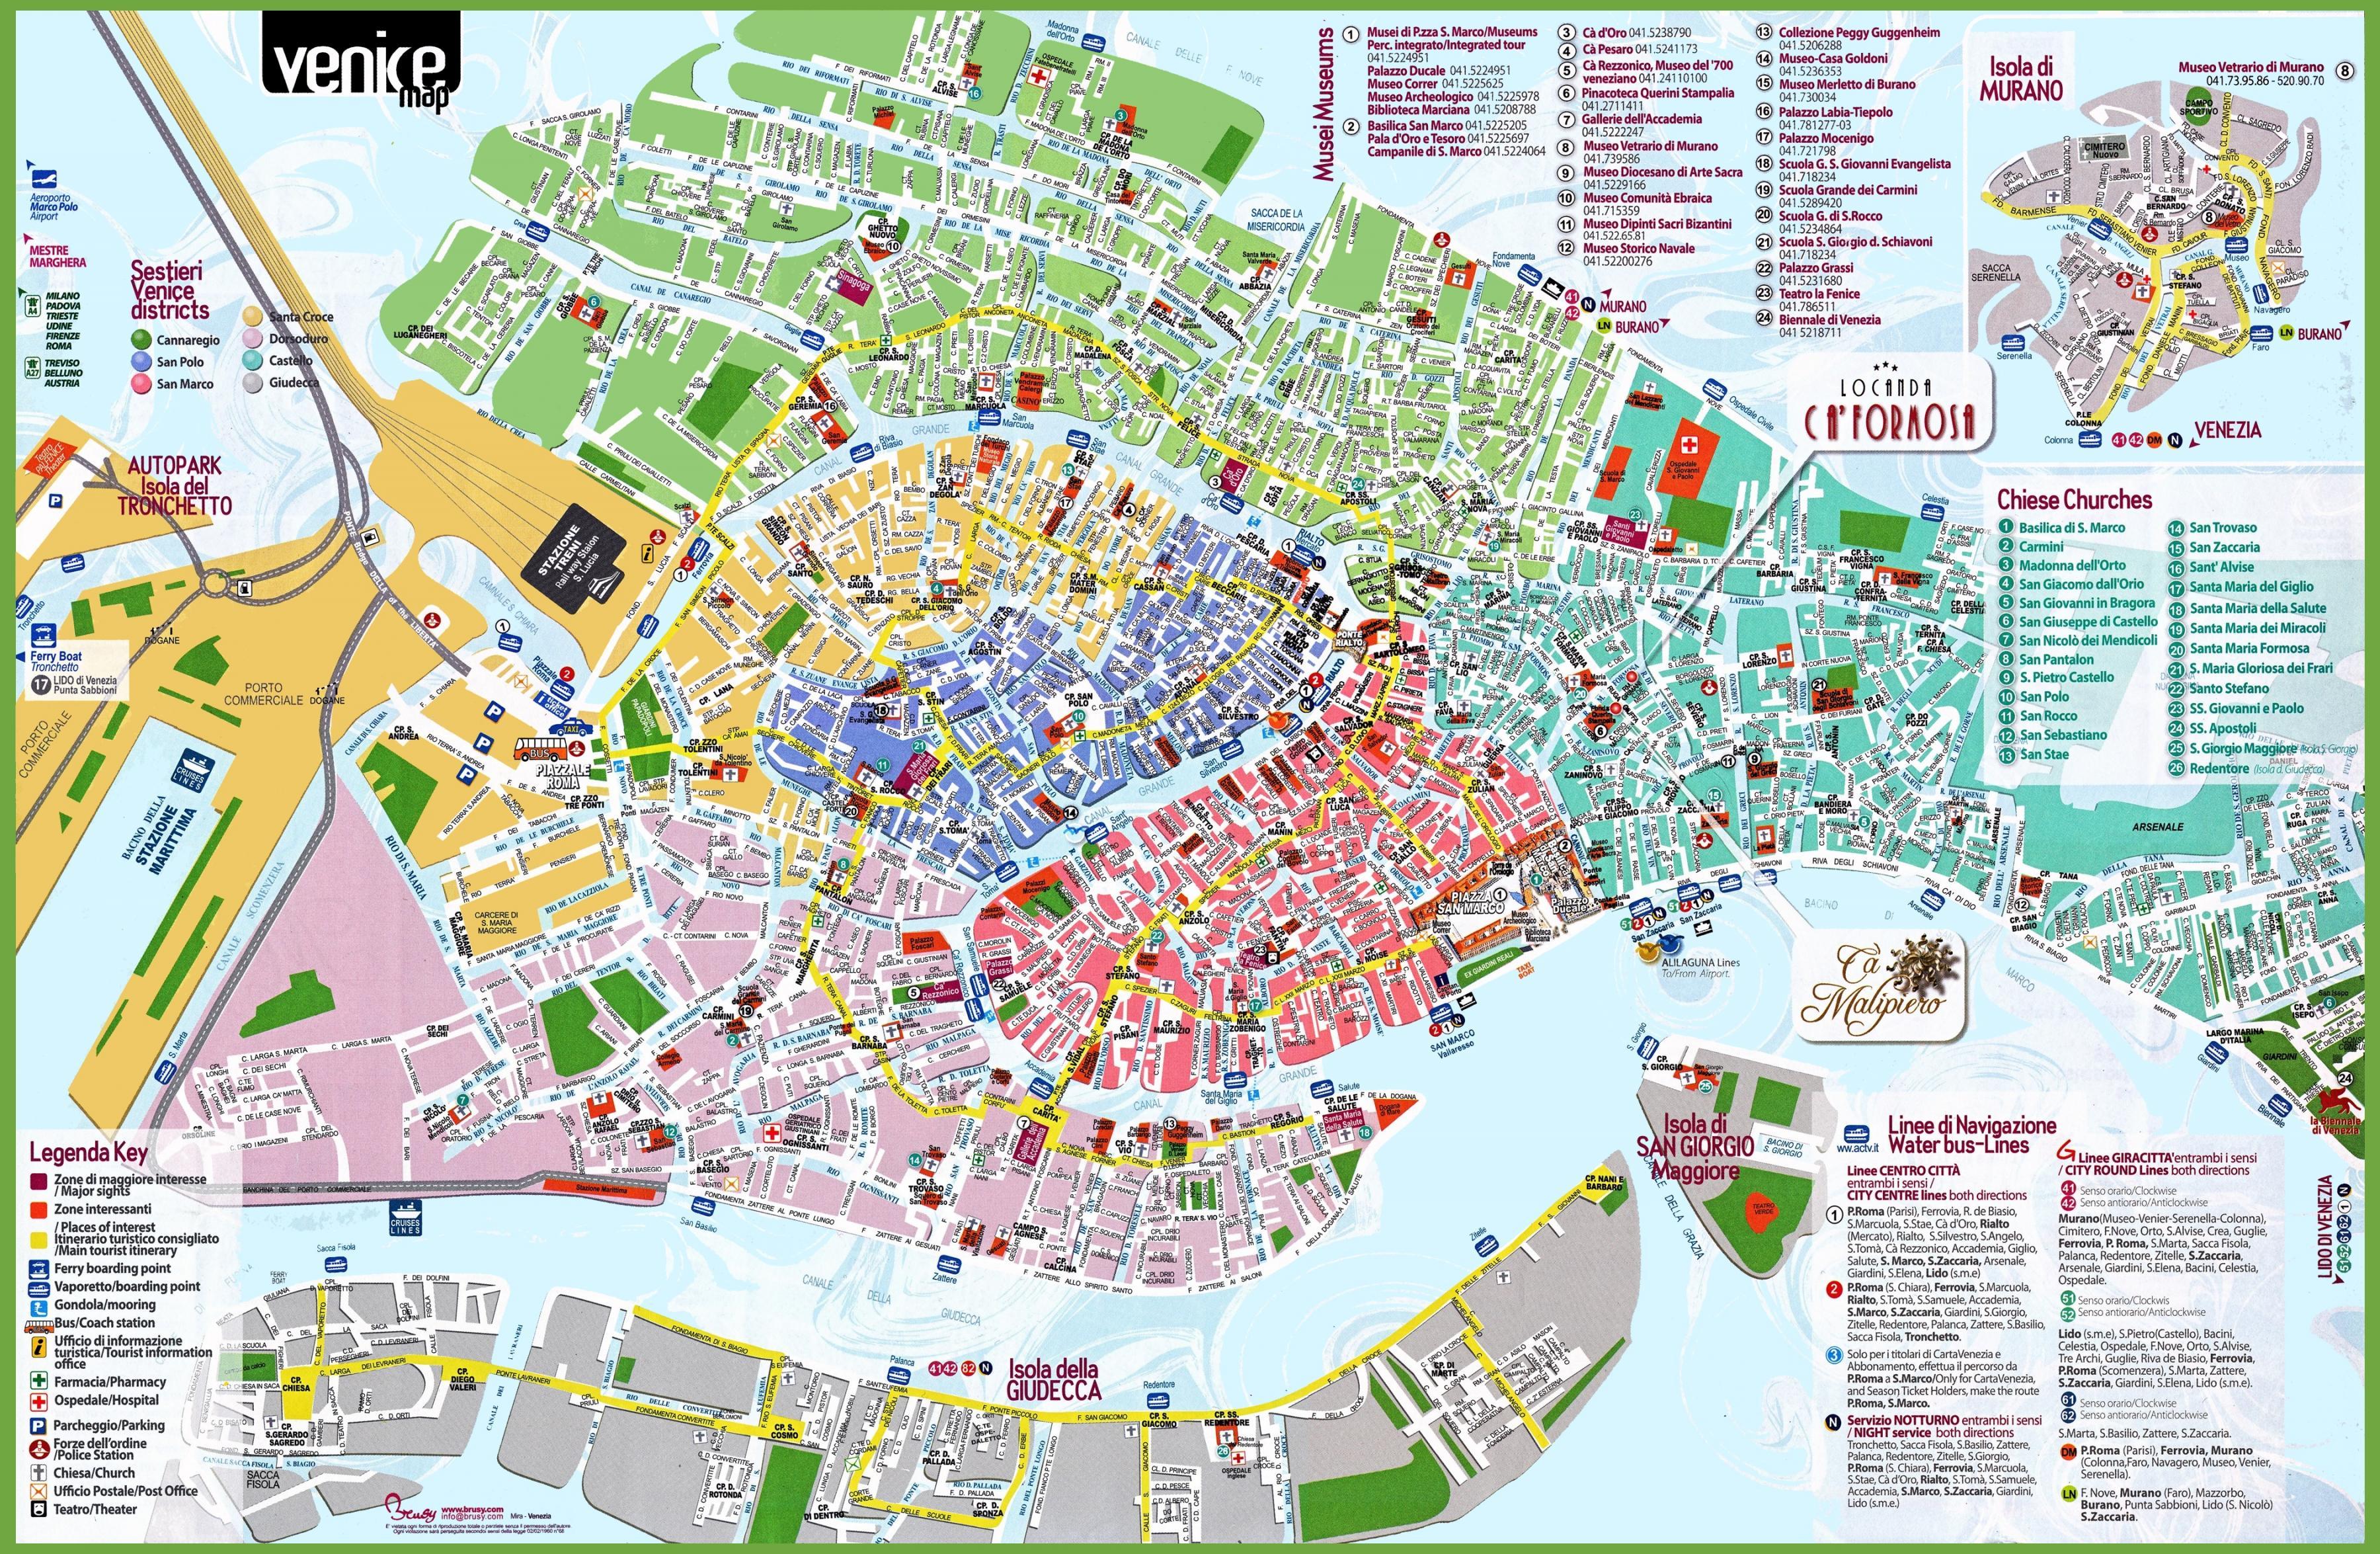 Turist Kort Over Venedig Italien Venedig Og Turistinformation